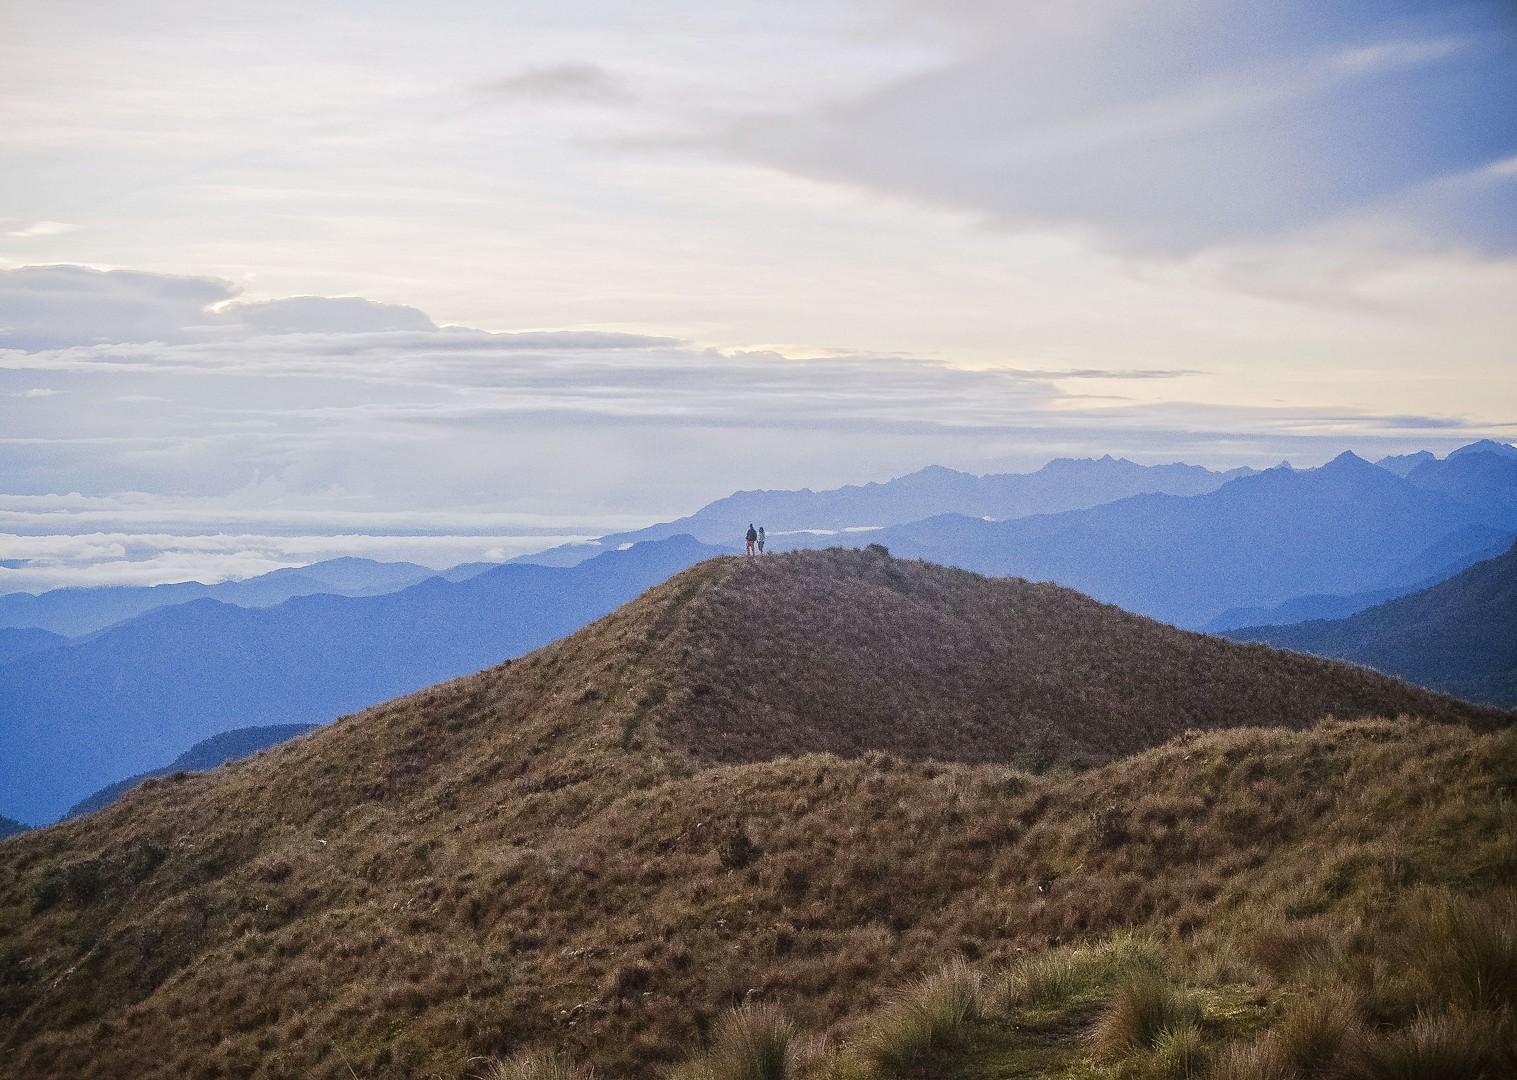 150423_Bike to Manu_25.JPG - Peru - Sacred Singletrack - Mountain Biking